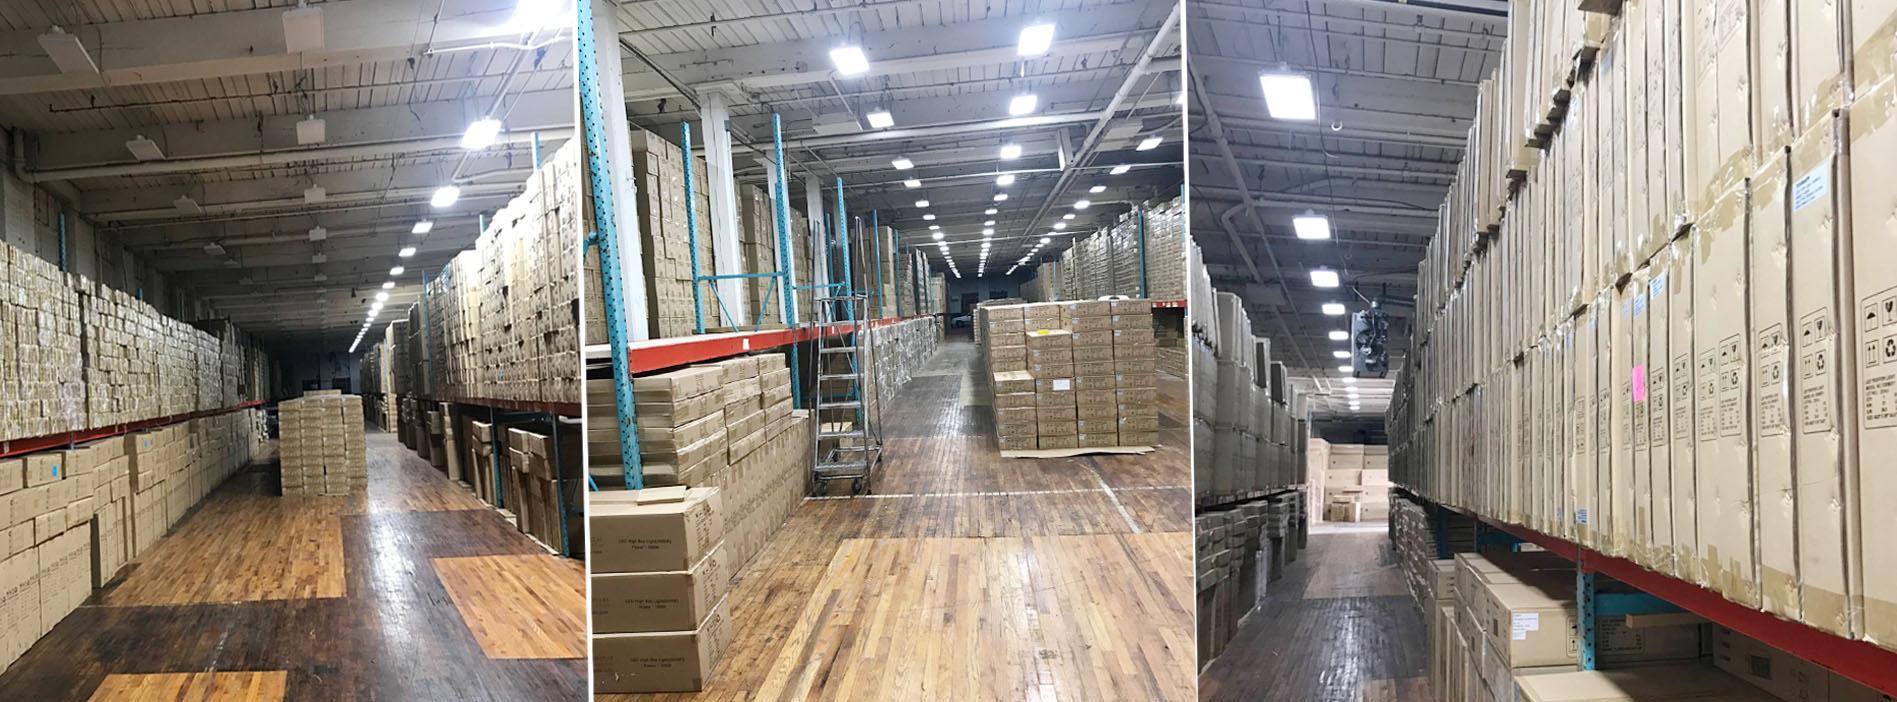 okaybulb warehouse